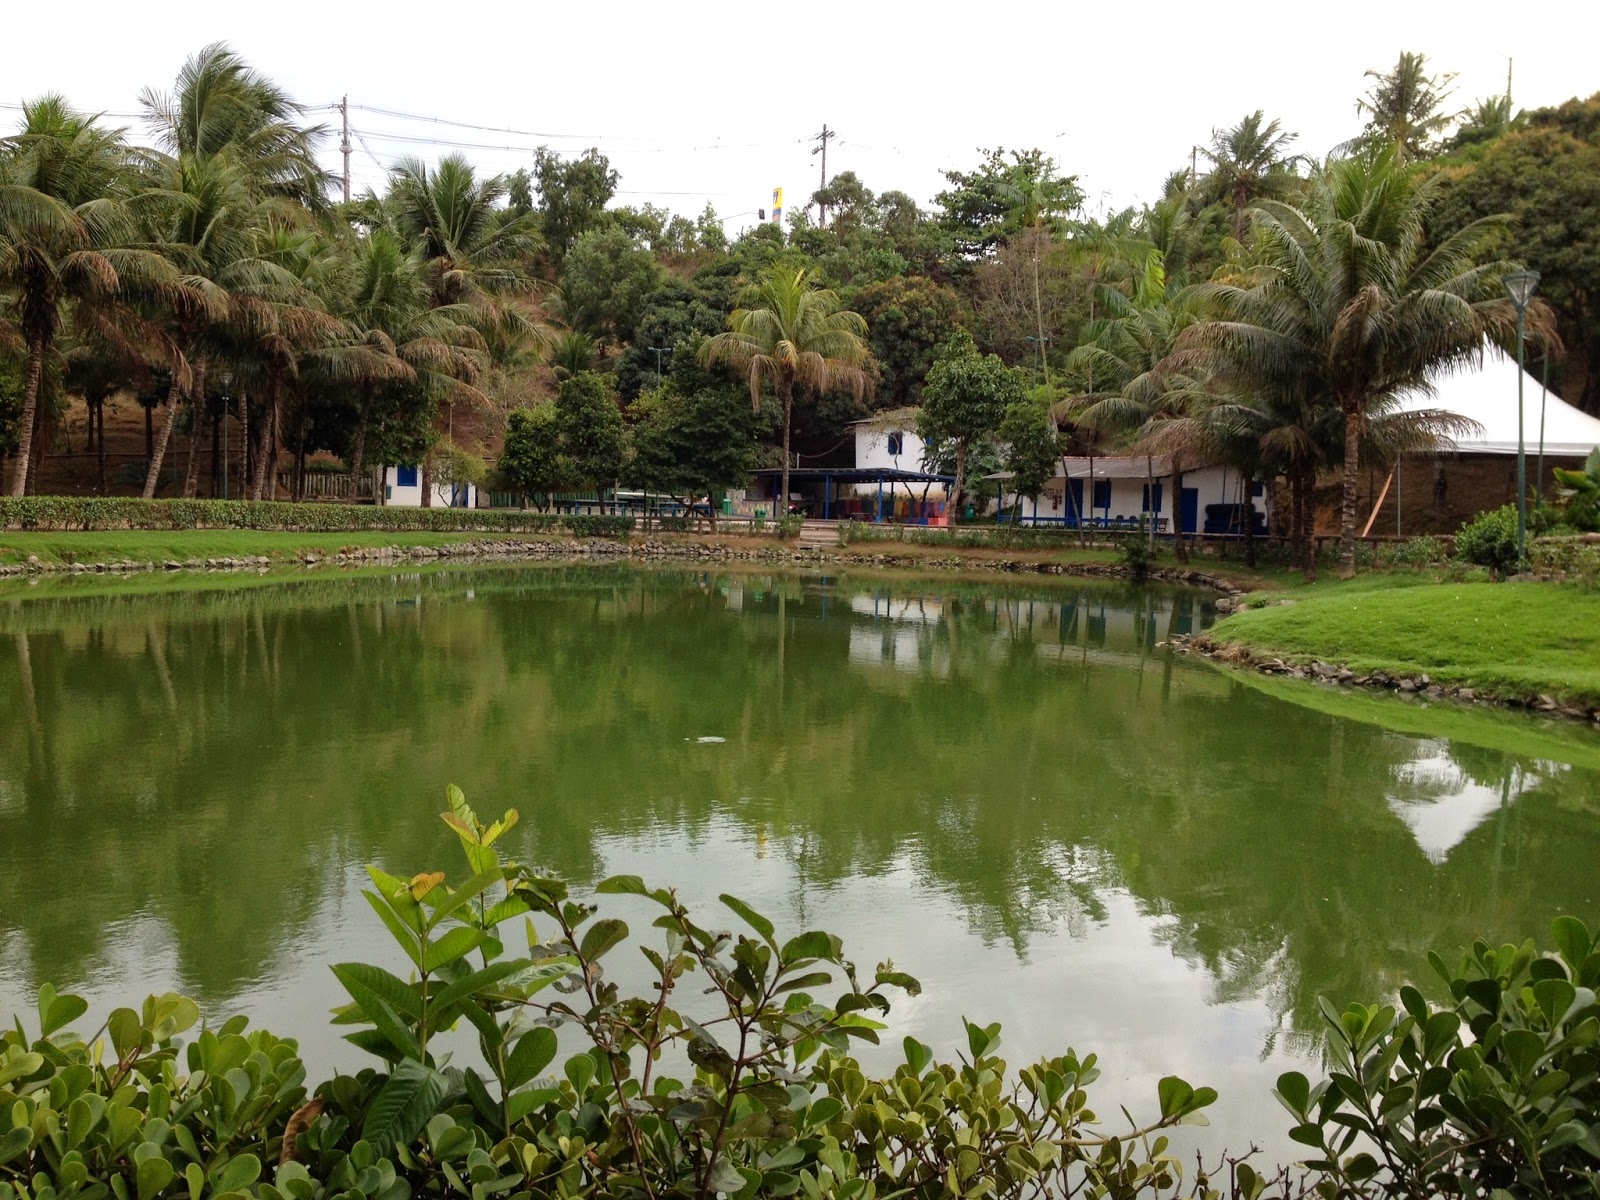 lago-parque-fazendinha-vitoria